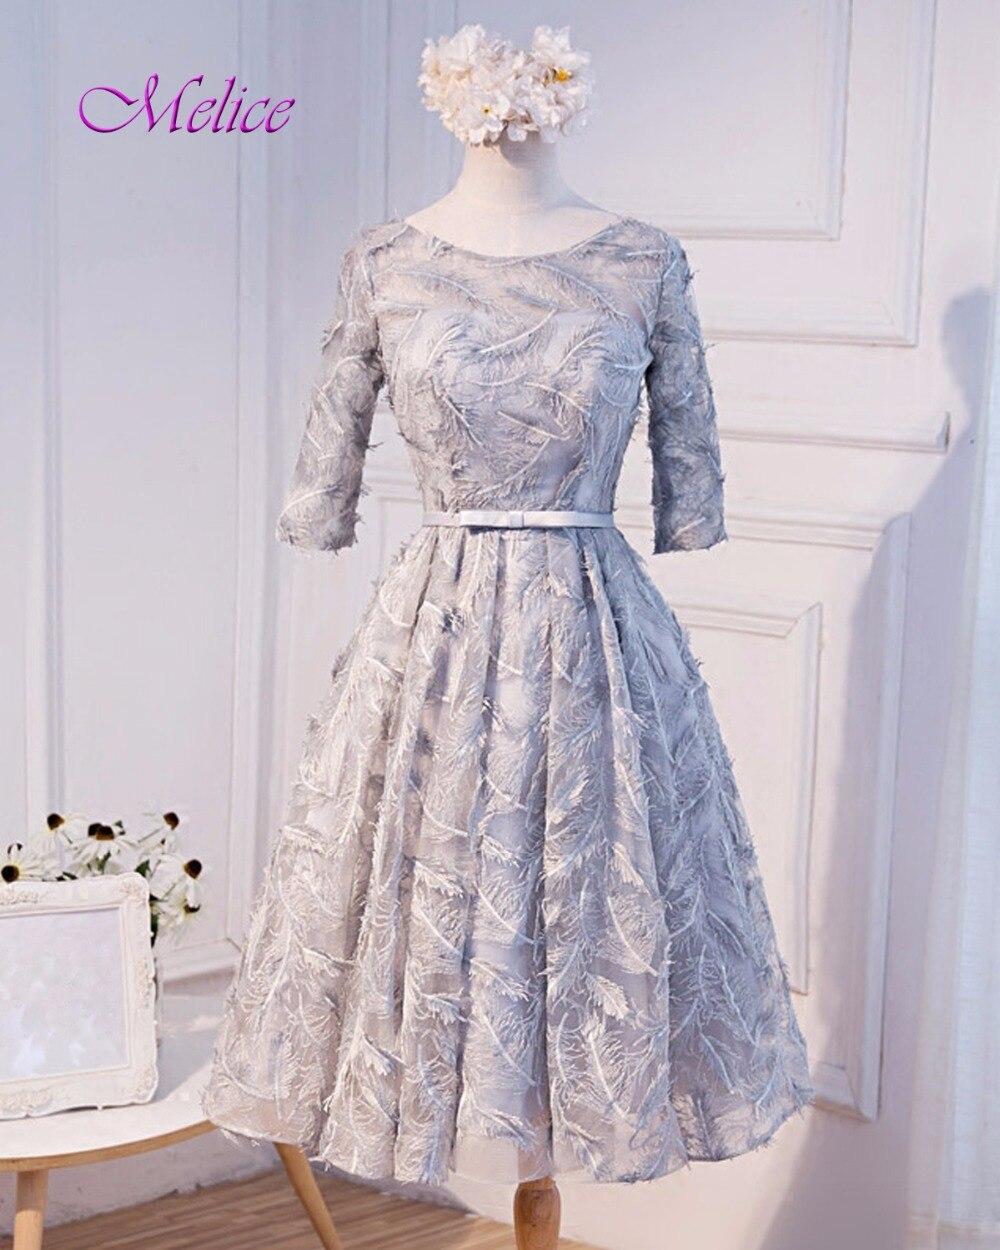 Fmogl Fashion Scoop Neck Feathers Lace   Prom     Dress   2019 Hot Sale Backless Sashes Formal Evening Gown Vestido de Festa Plus Size